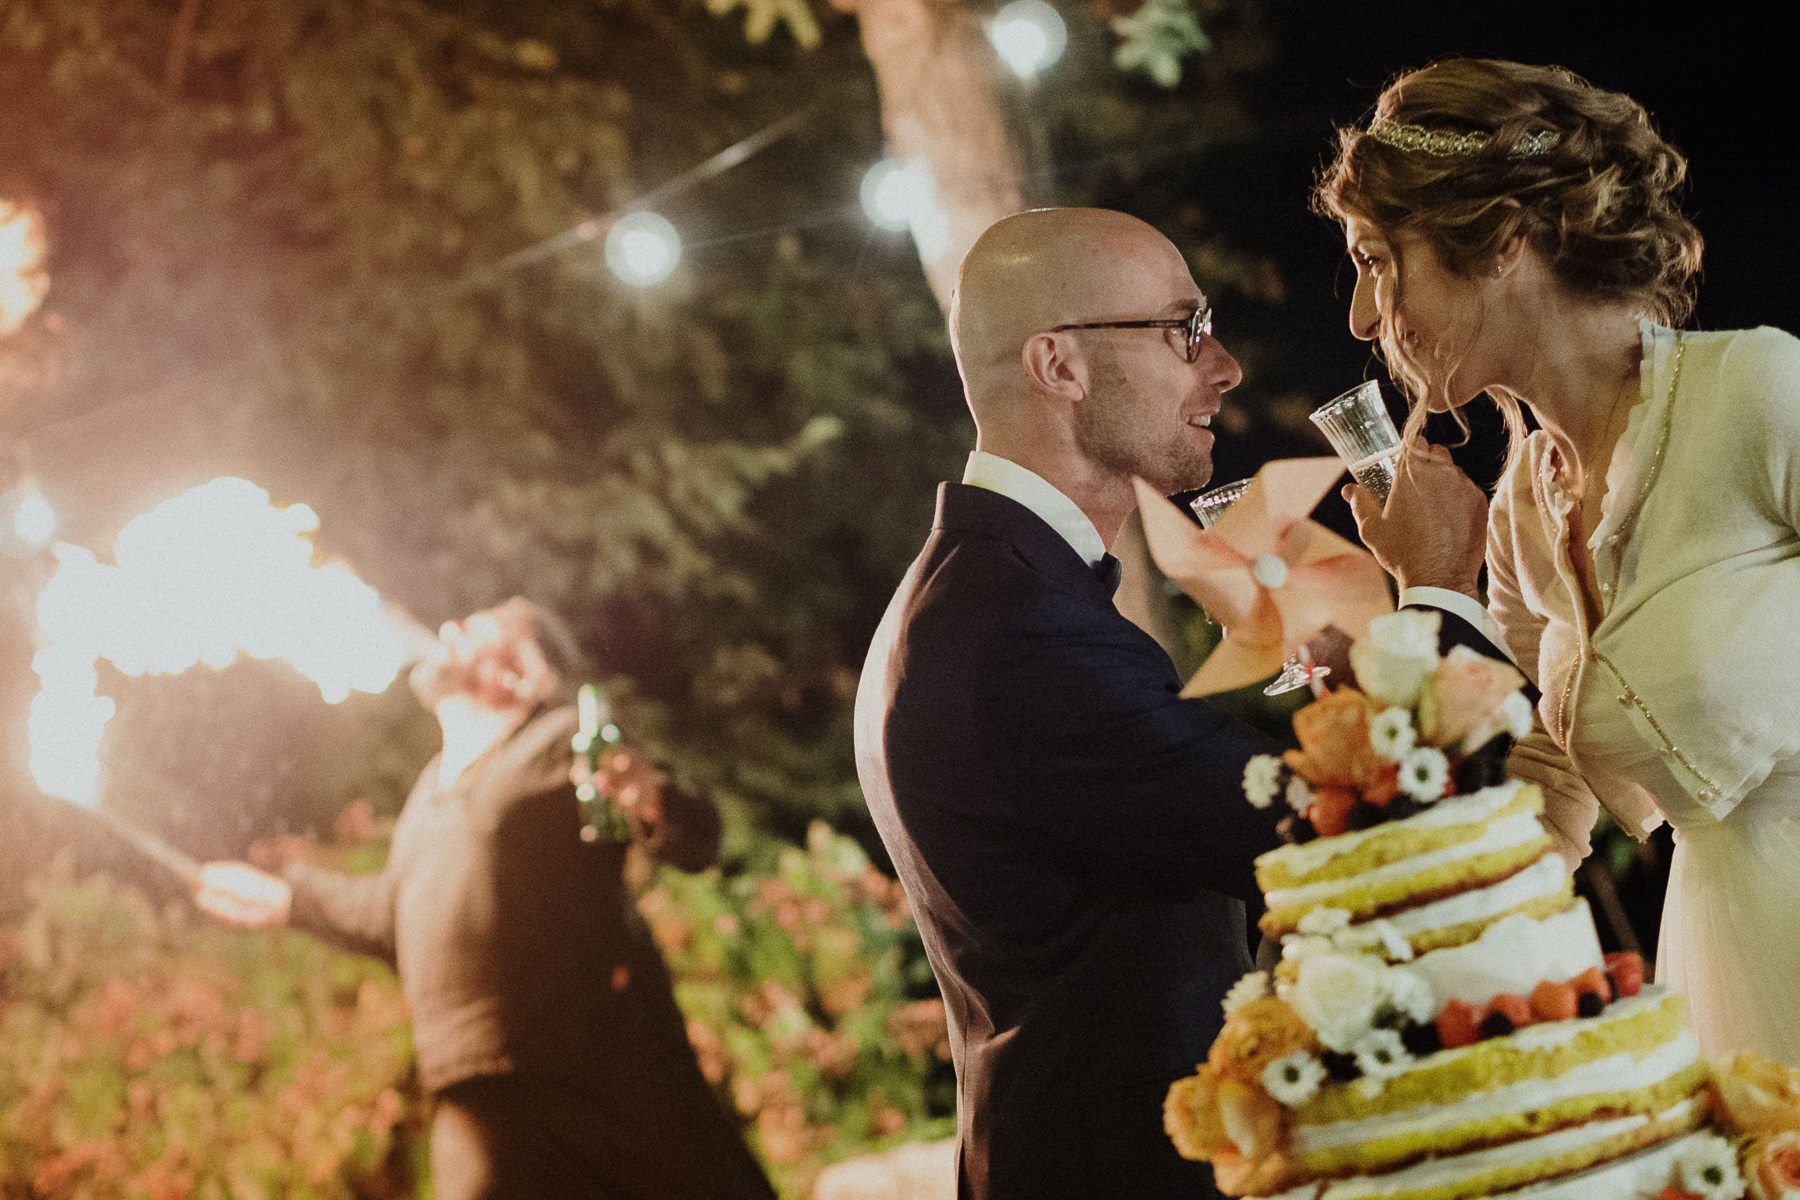 fotografo-matrimonio-monte-gesso-taglio-torta-francesco-ferrarini